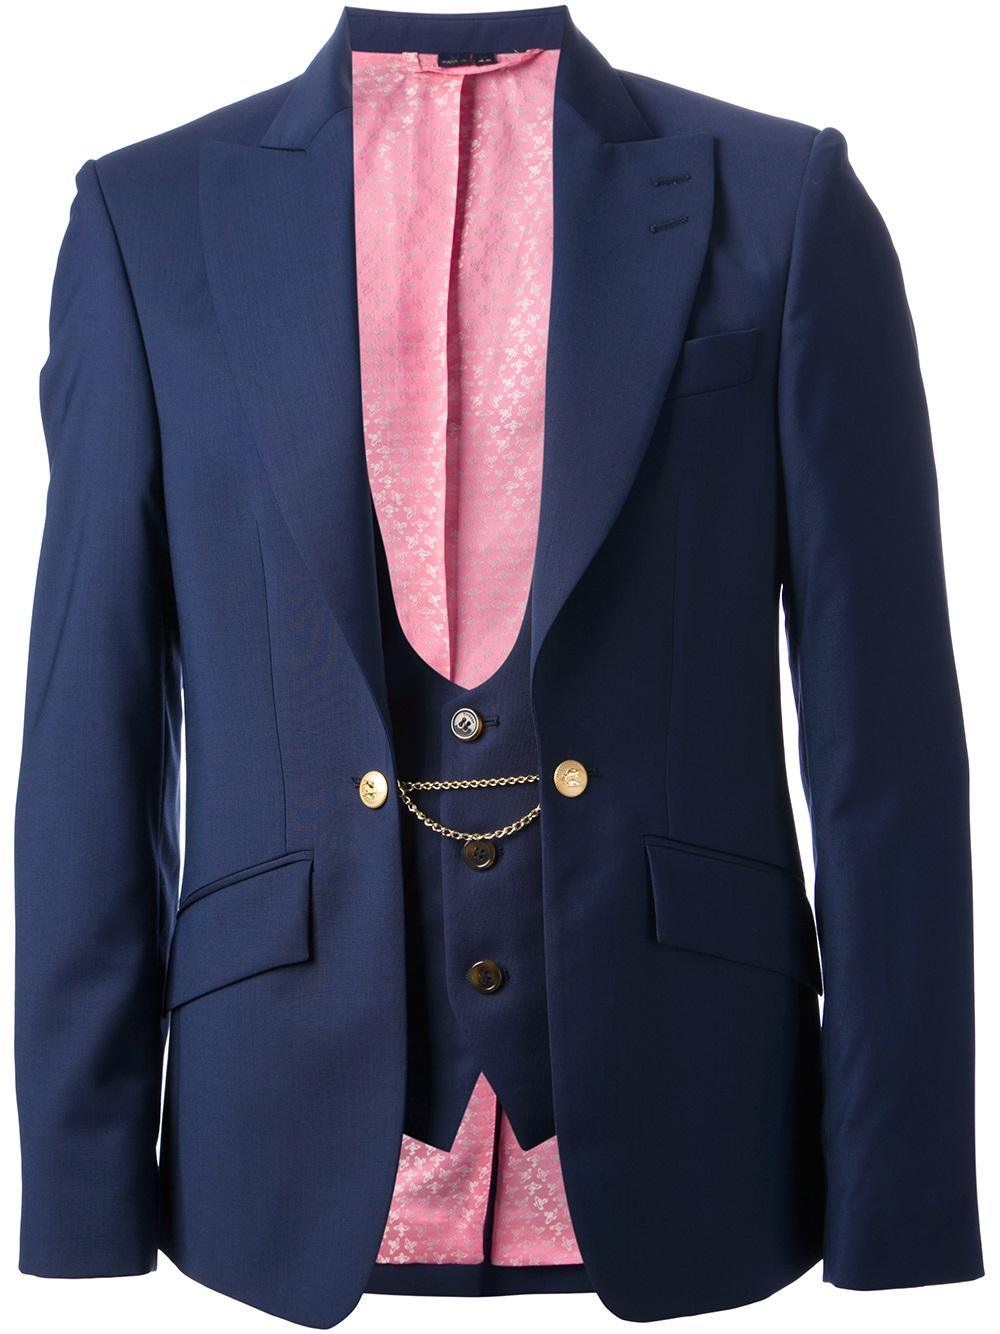 Vivienne Westwood Blazer And Waist Coat In Blue For Men Lyst